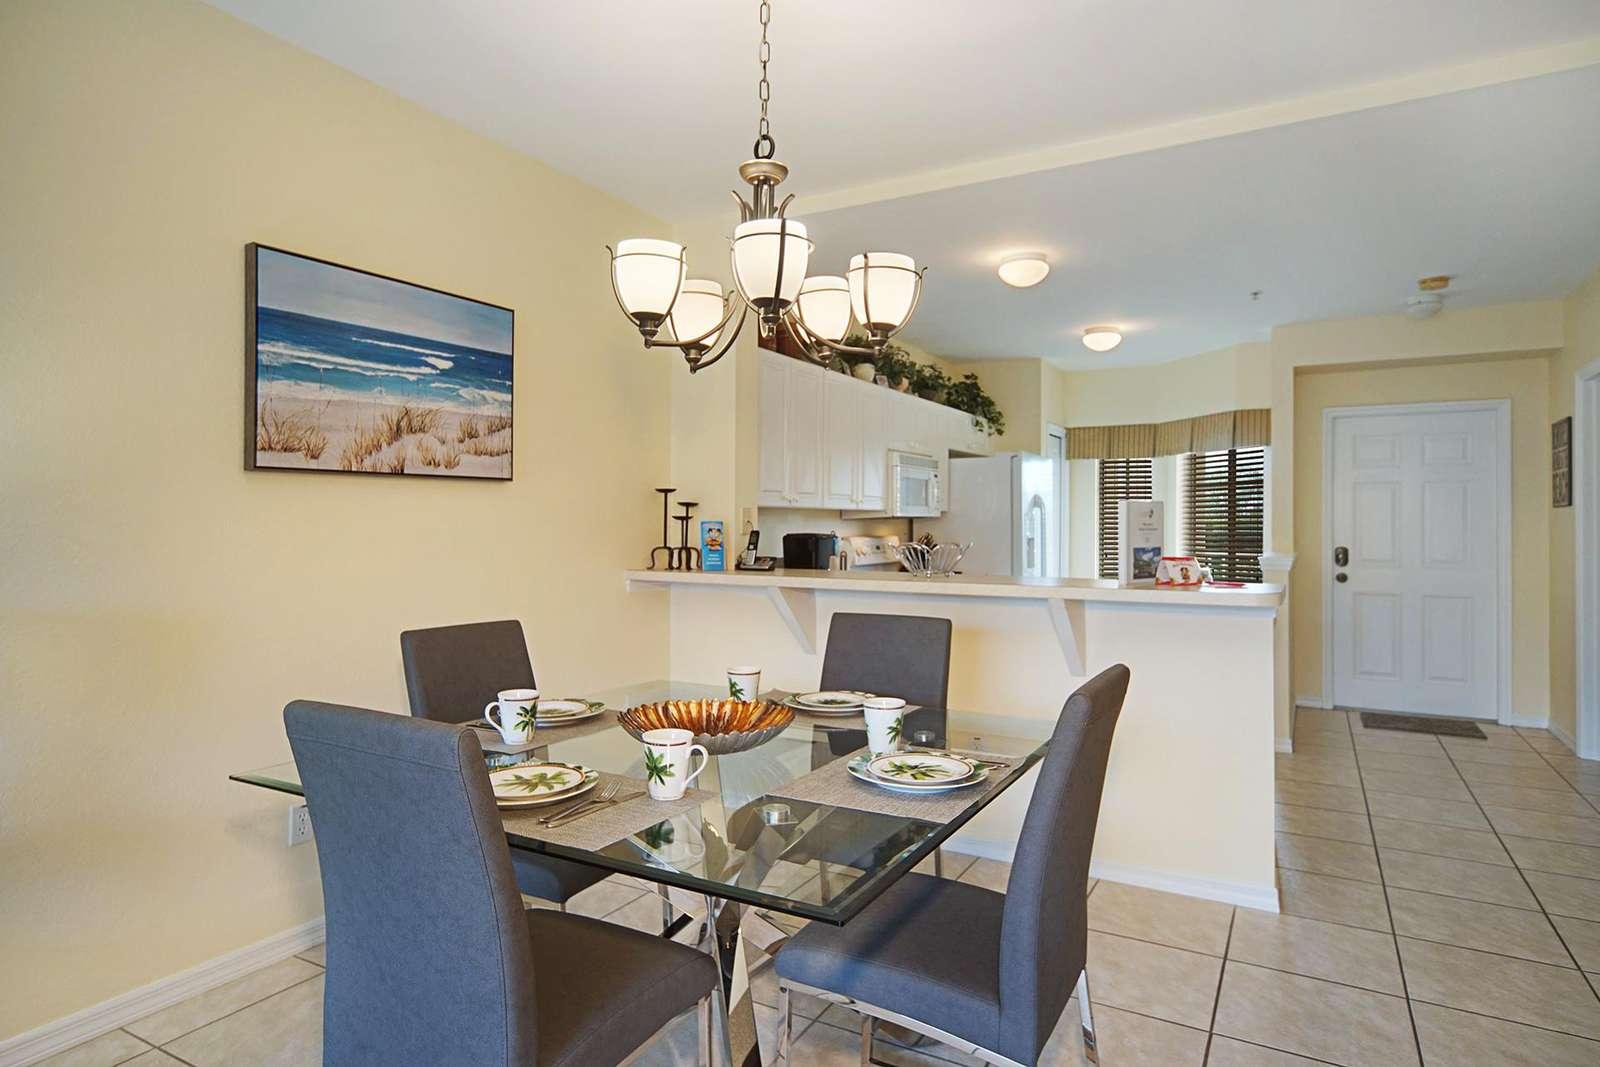 Wischis Florida Home - Ferienhaus Naples - Hausverwaltung - Immobilien